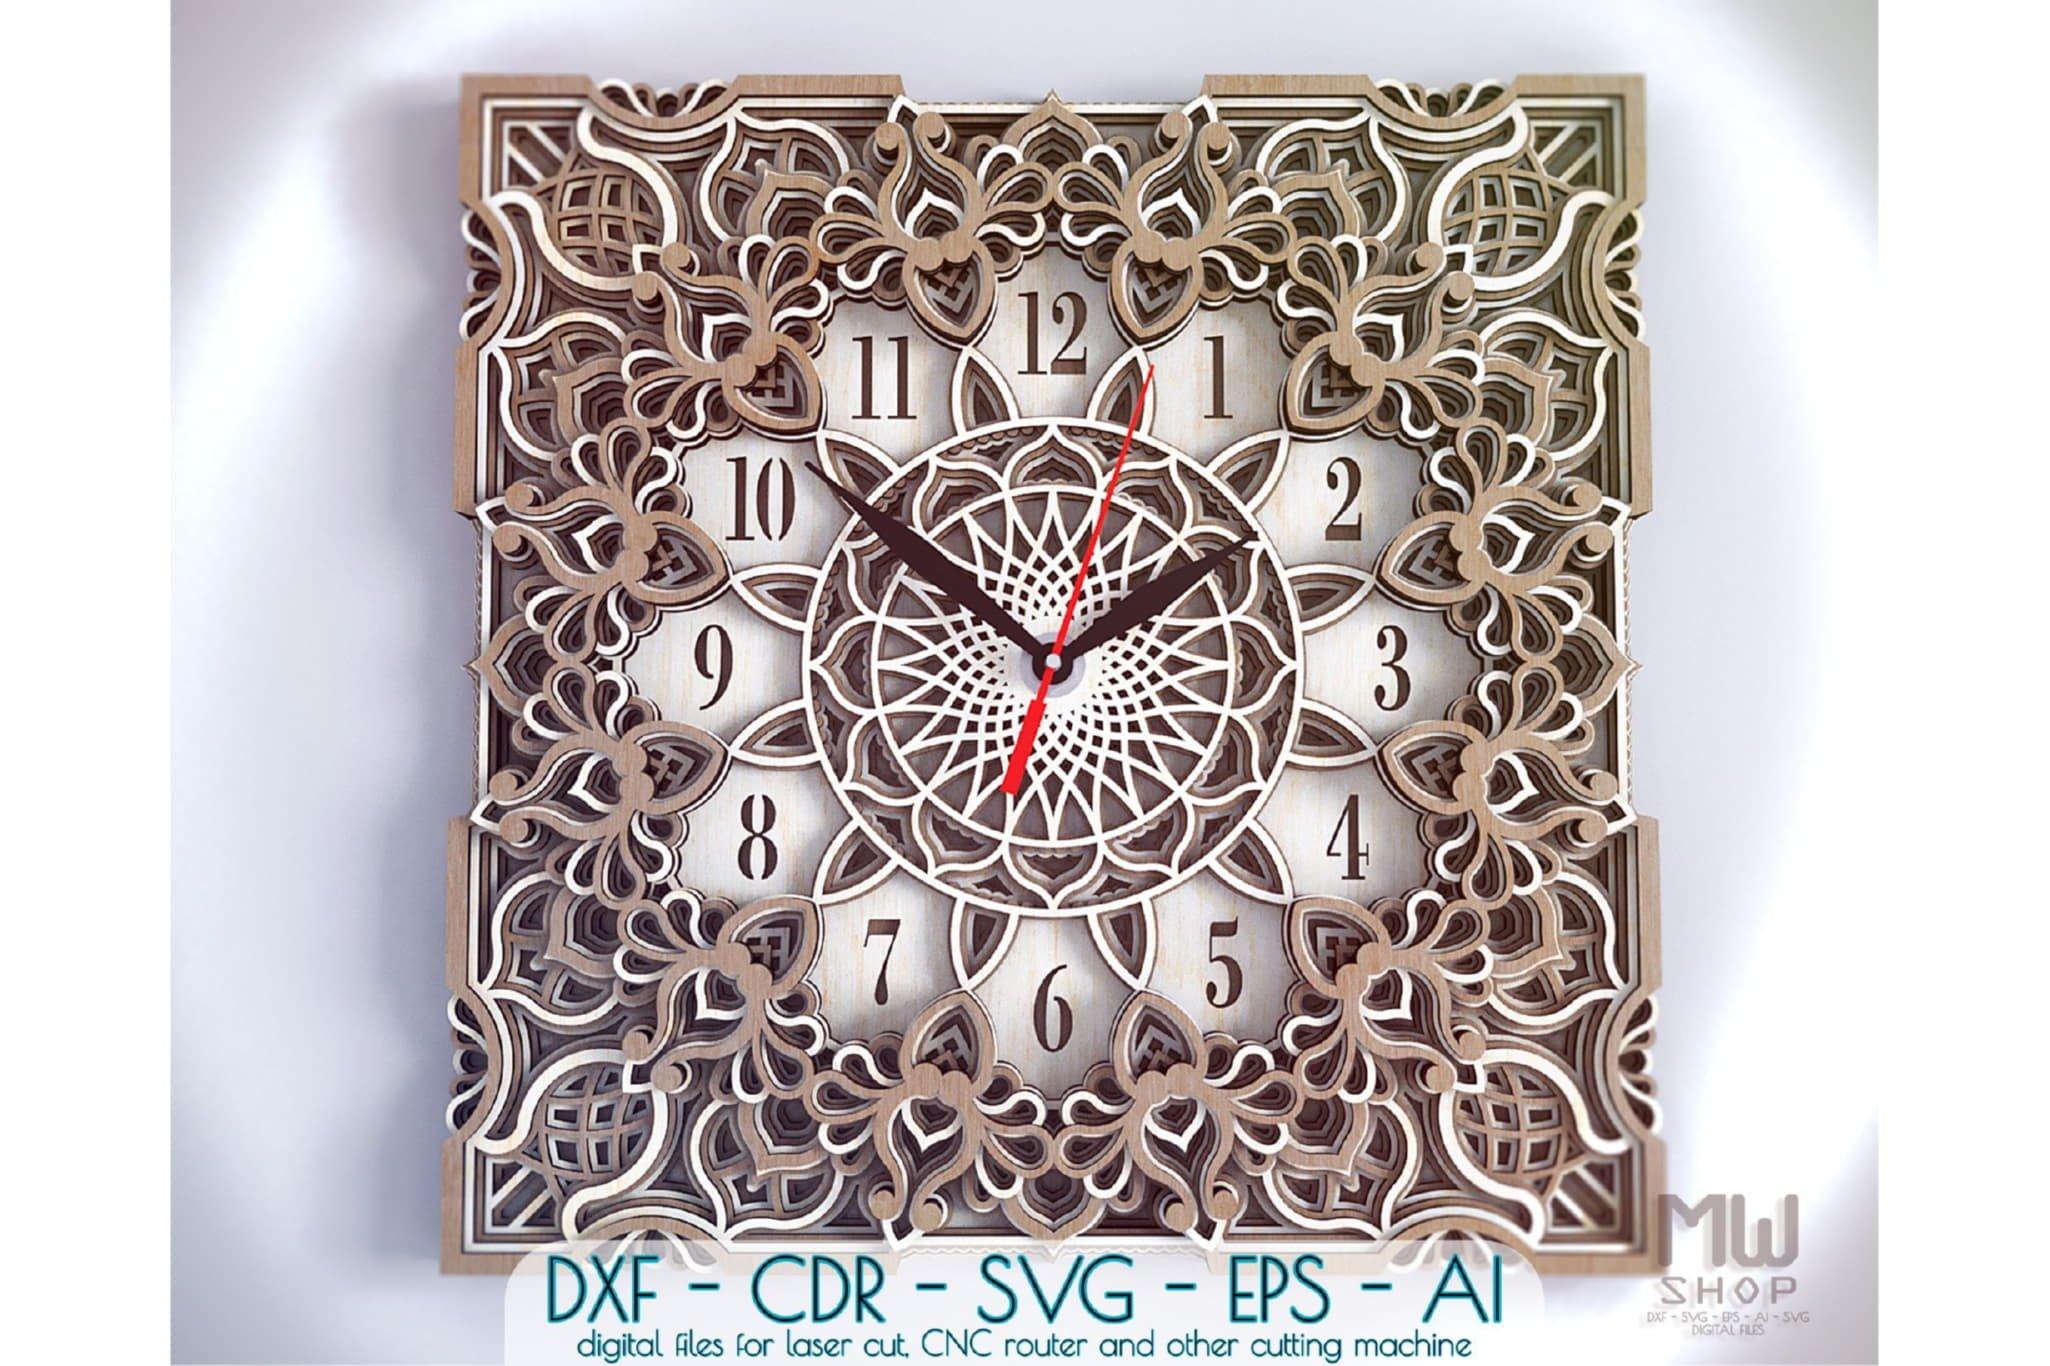 C13 - Mandala Clock DXF for Laser cut, Sacred Clock SVG example image 1